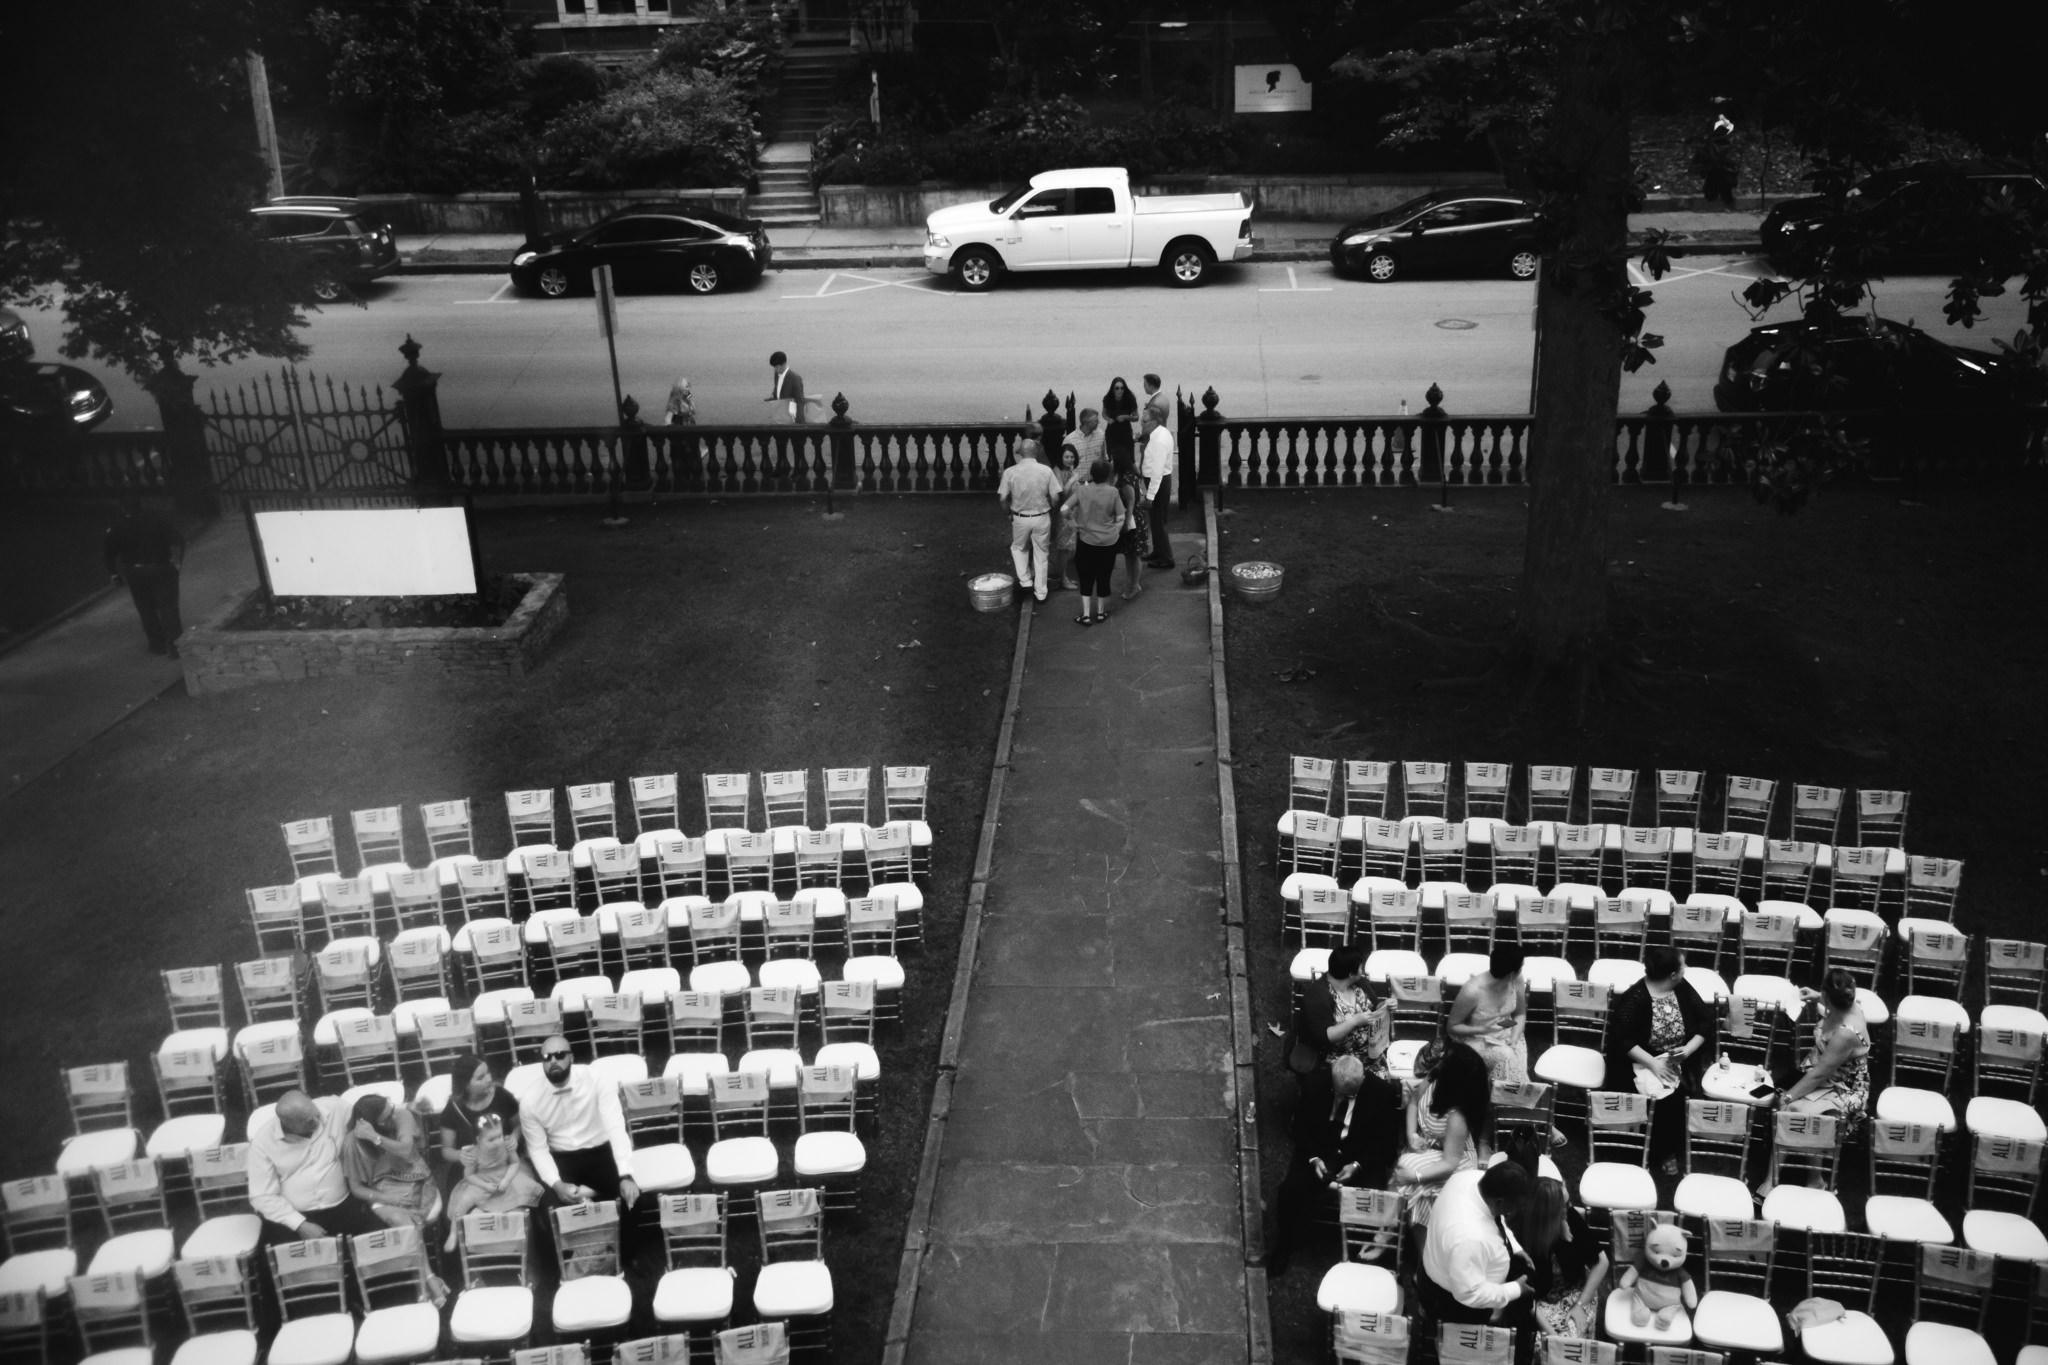 woodruff-fontaine-wedding-venue-memphis-thewarmtharoundyou-brenda-taylor-19.jpg